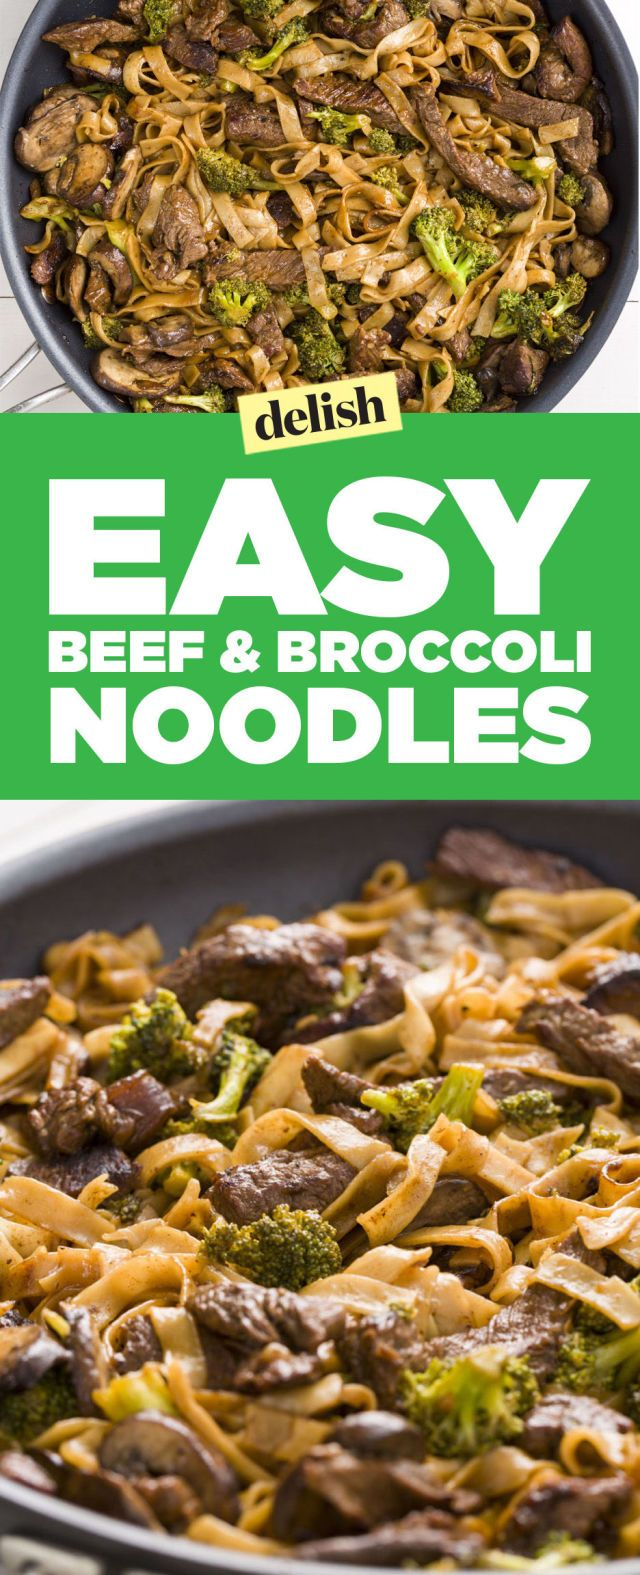 Skinny Beef & Broccoli Noodles